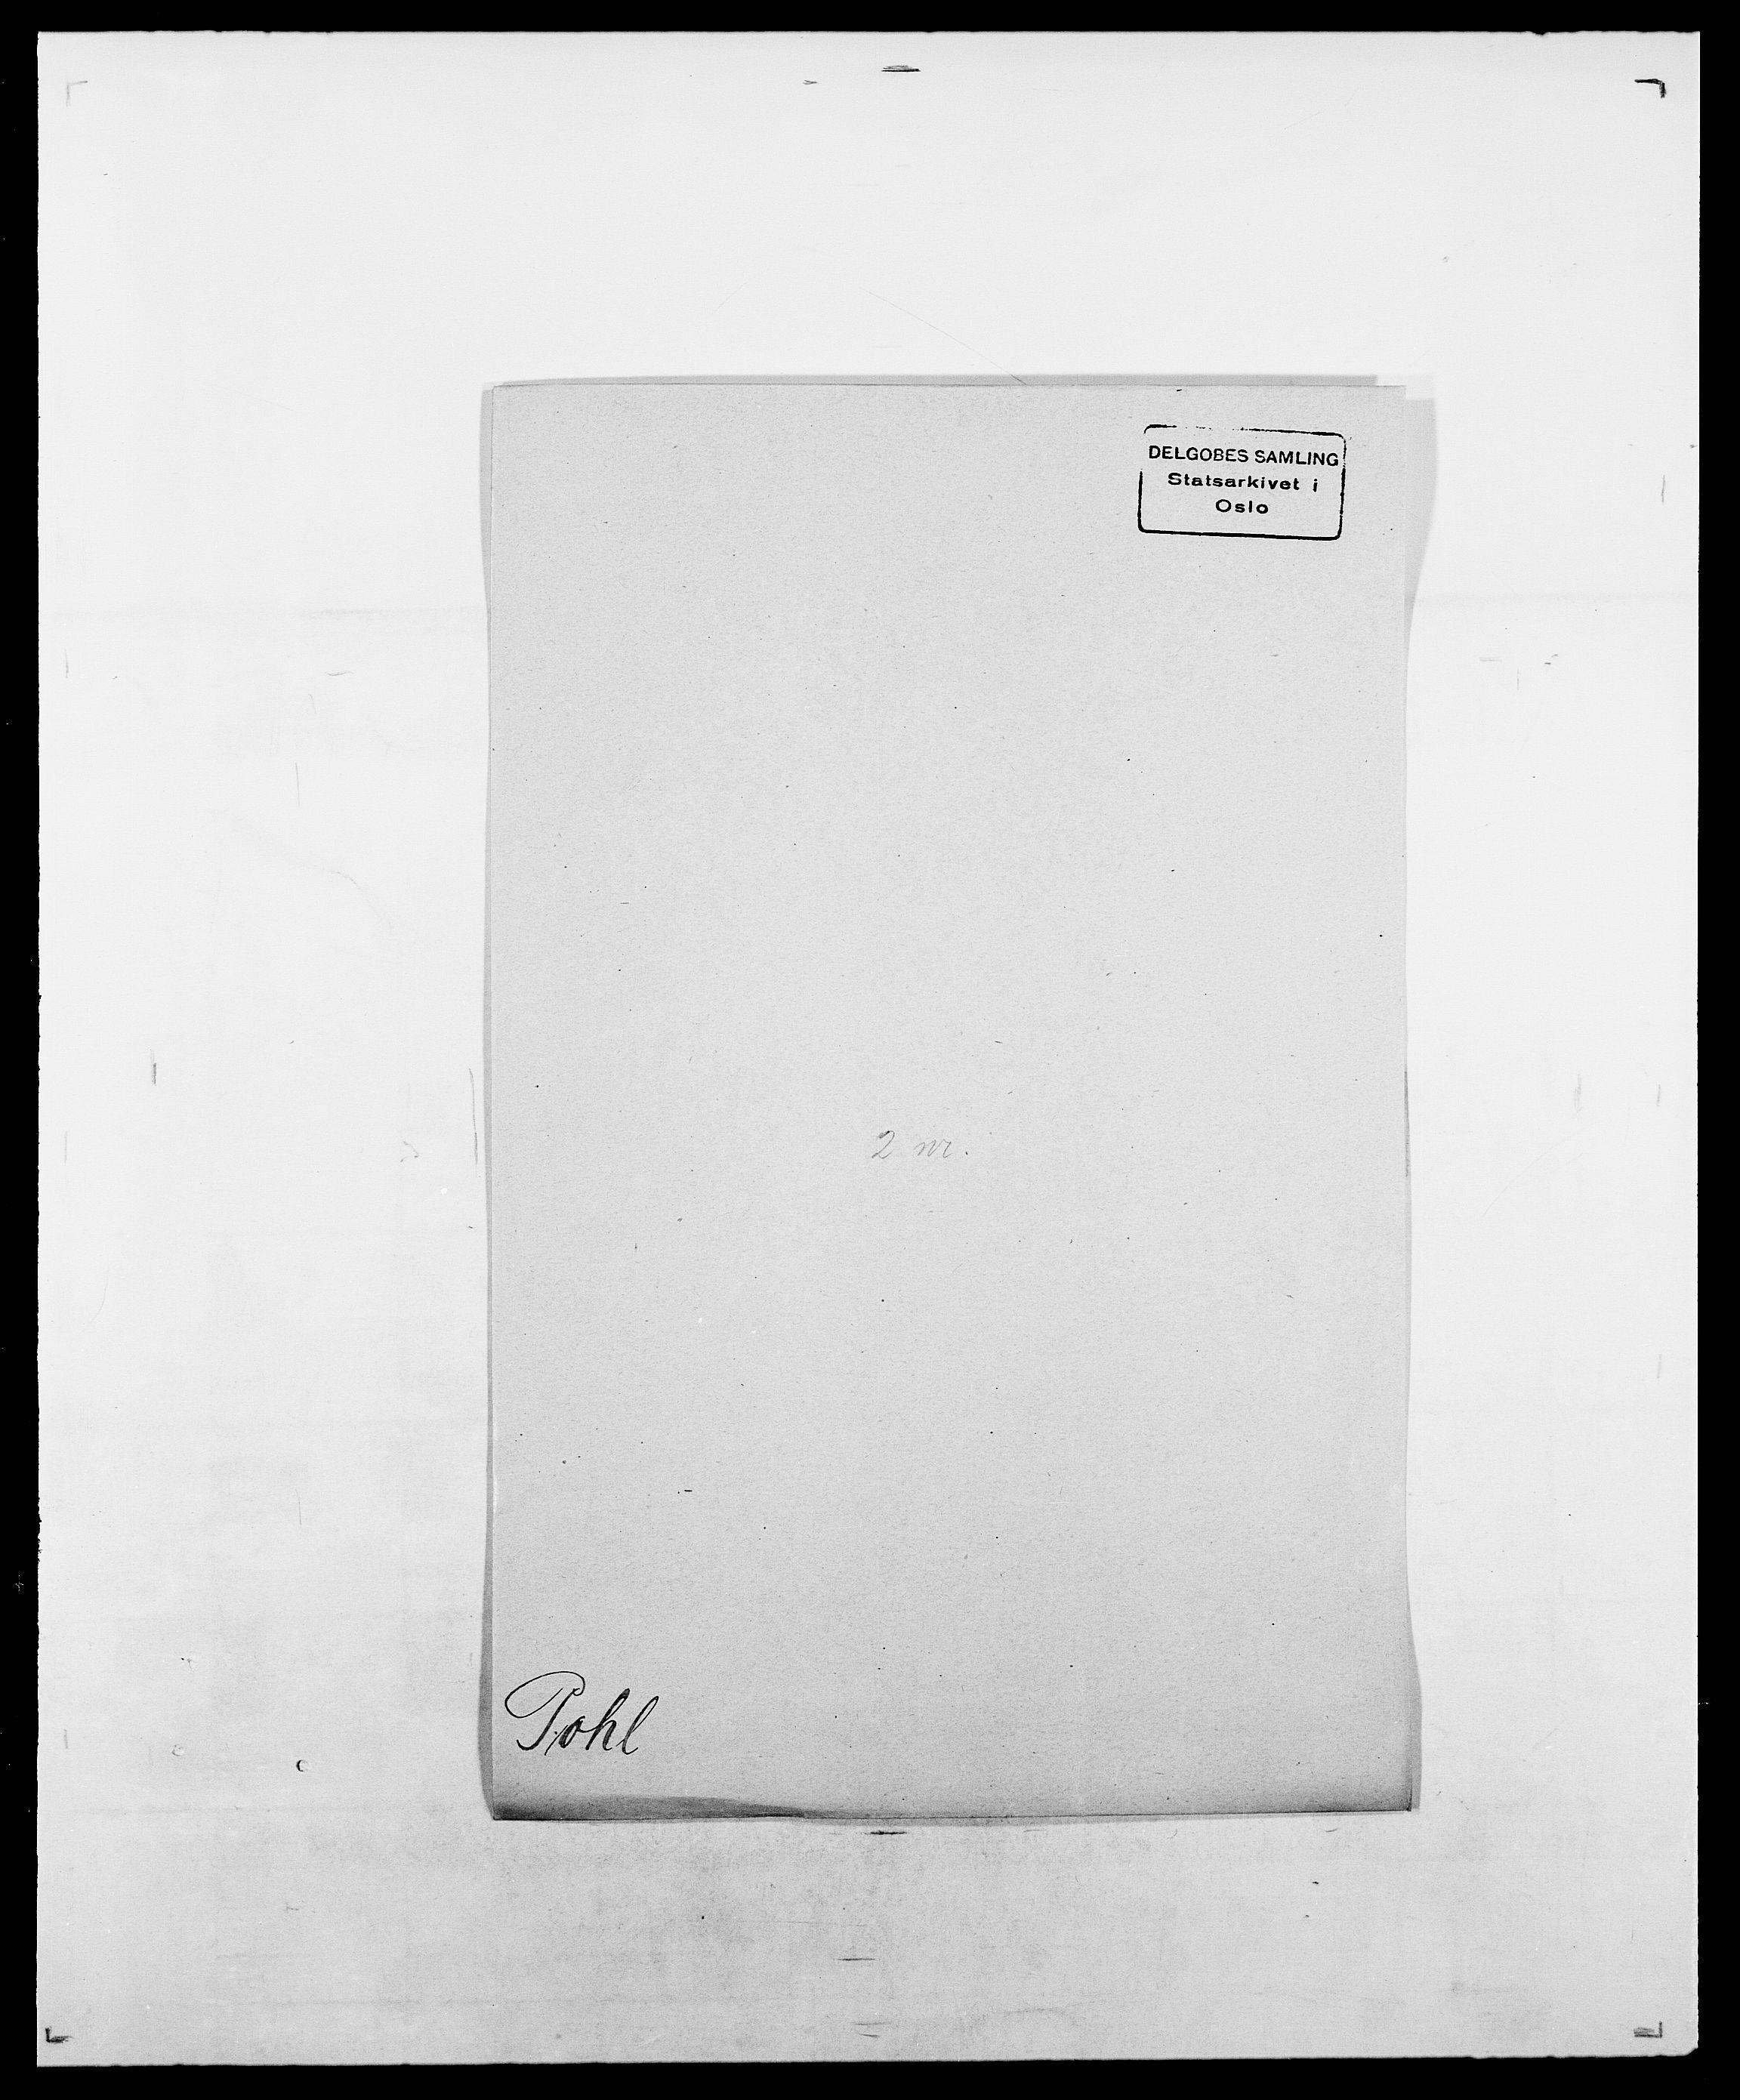 SAO, Delgobe, Charles Antoine - samling, D/Da/L0031: de Place - Raaum, s. 164